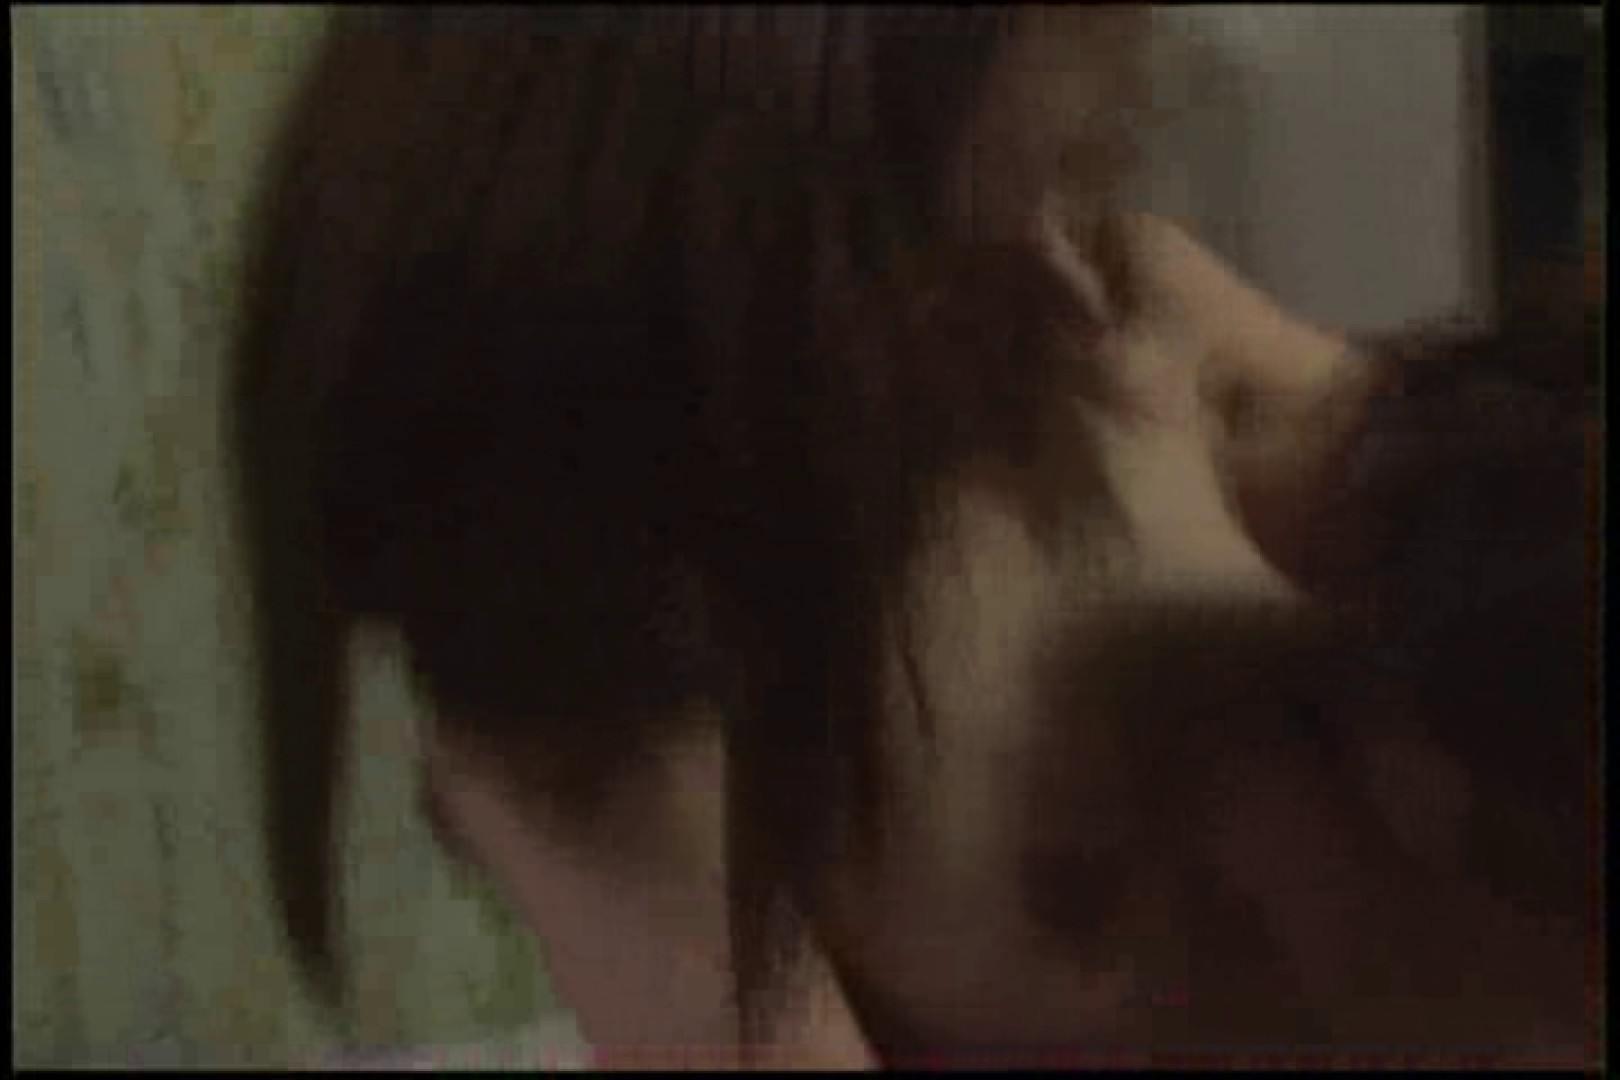 Hなフェロモン漂わせまくりな美人妻 佐々木薫子 人妻  110連発 67